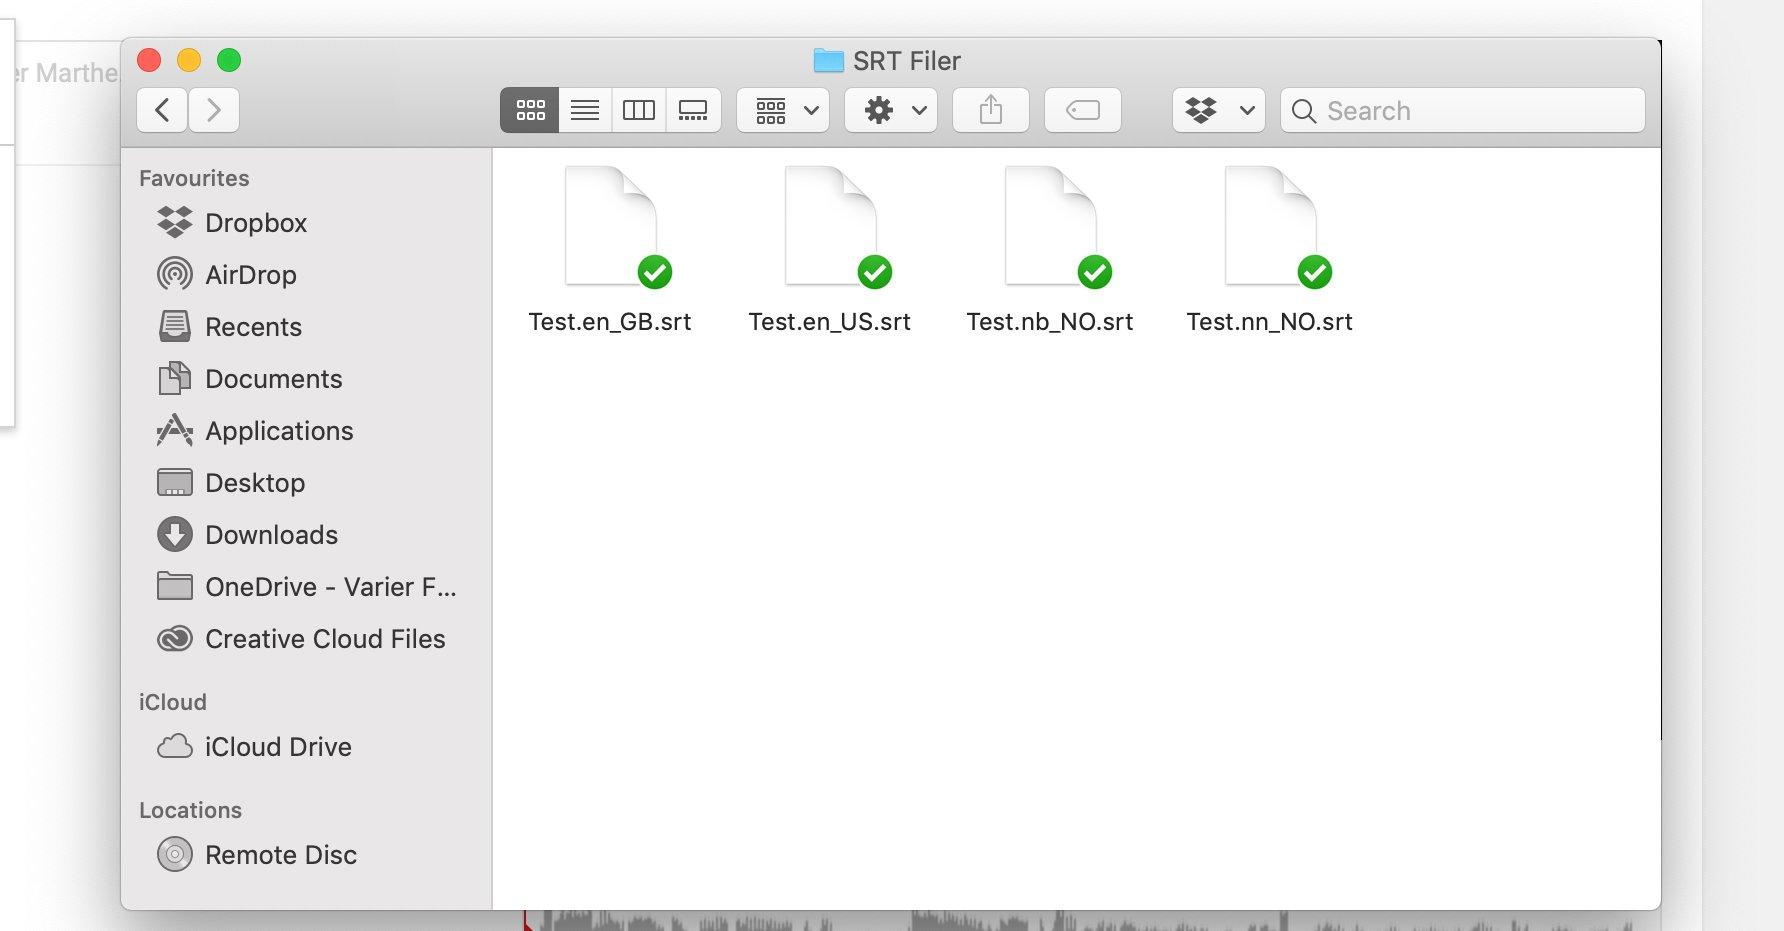 Screenshot 2020-02-21 at 11.36.44 AM copy